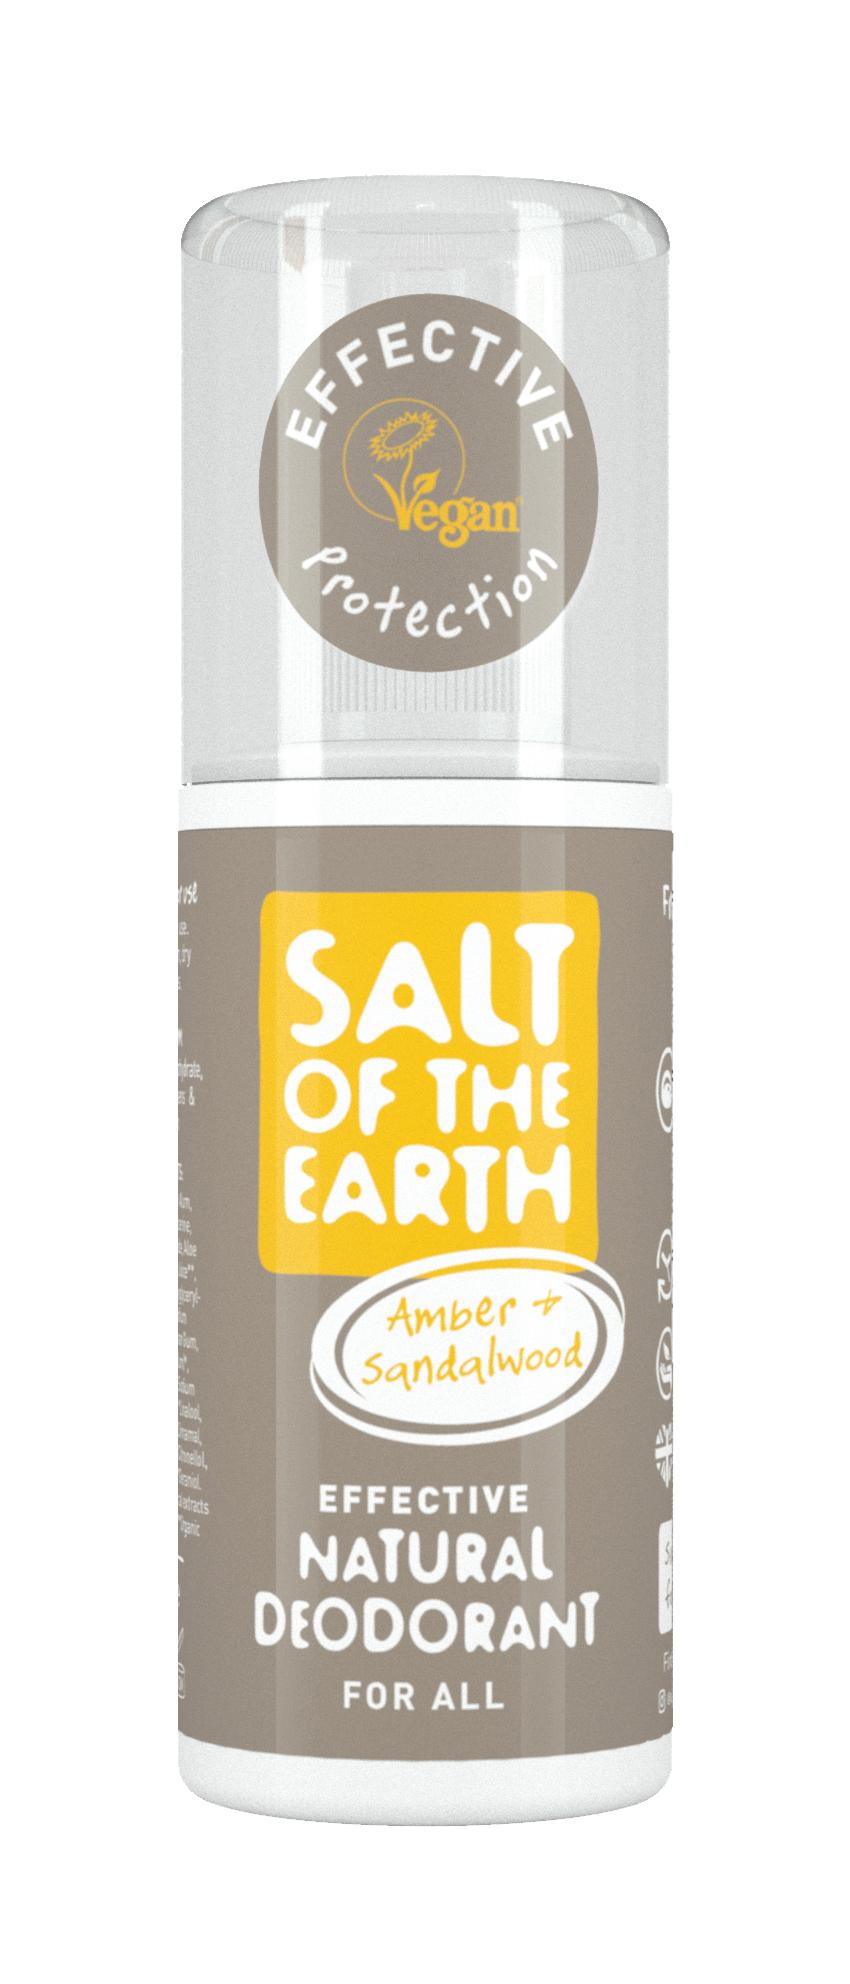 Amber & Sandalwood Natural Deodorant Spray 100ml